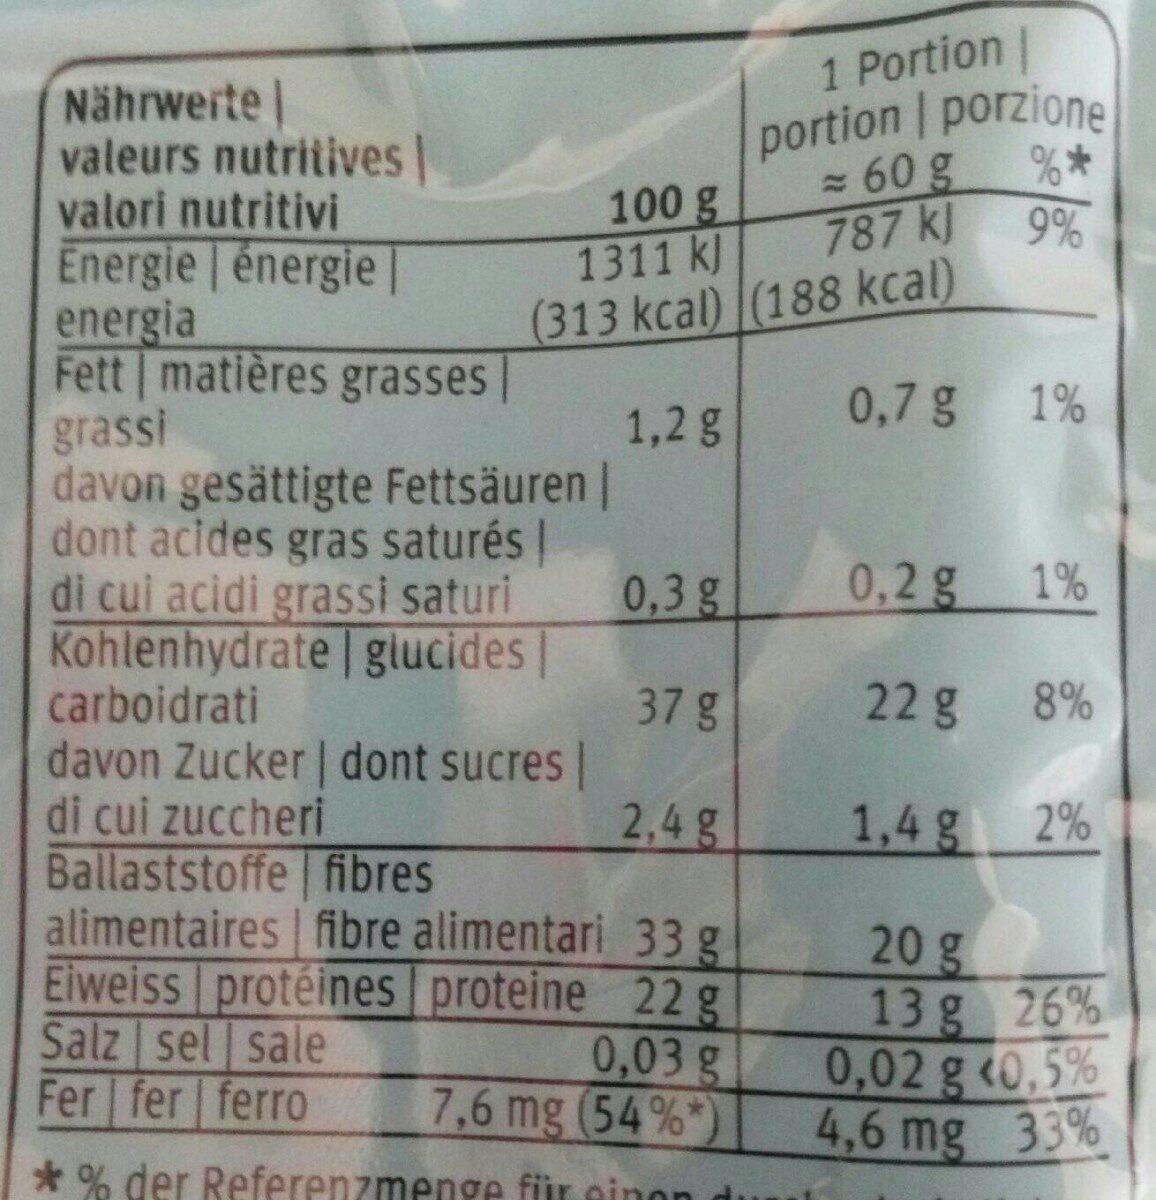 Haricots blancs - Nährwertangaben - it